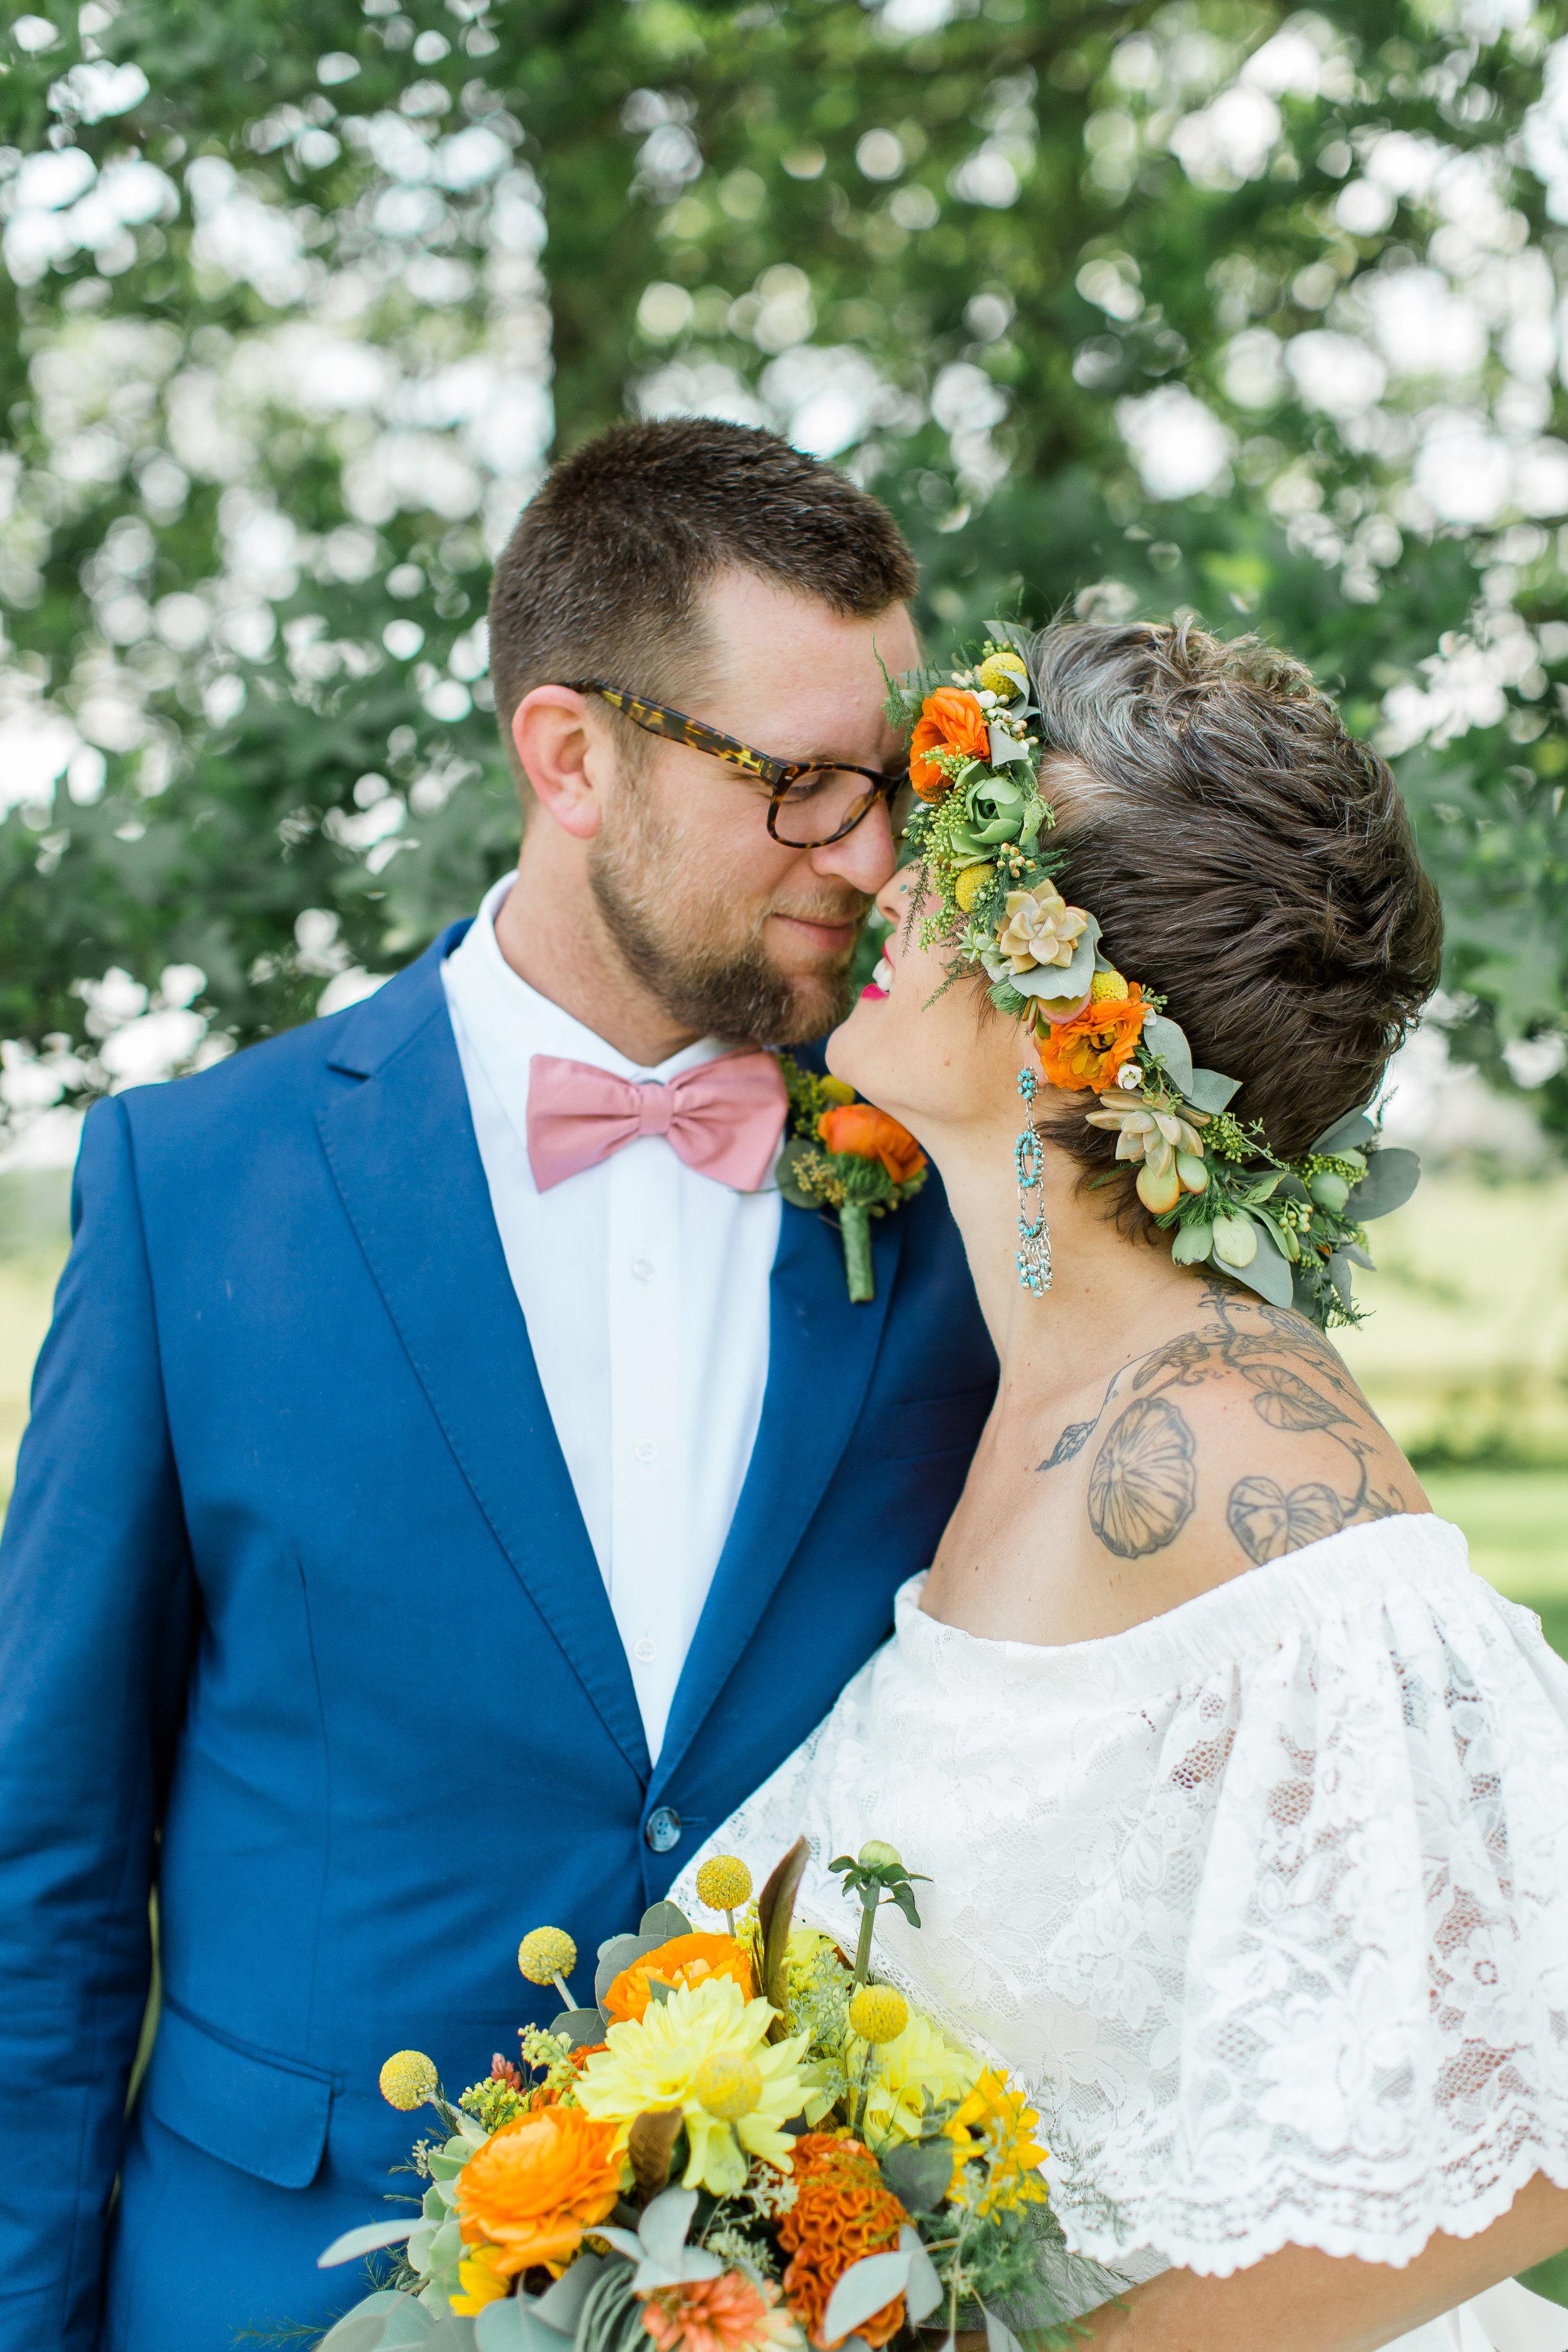 pittsburgh-wedding-photographer-armstrongfarms-eclectic-offbeat-boho0140.jpg